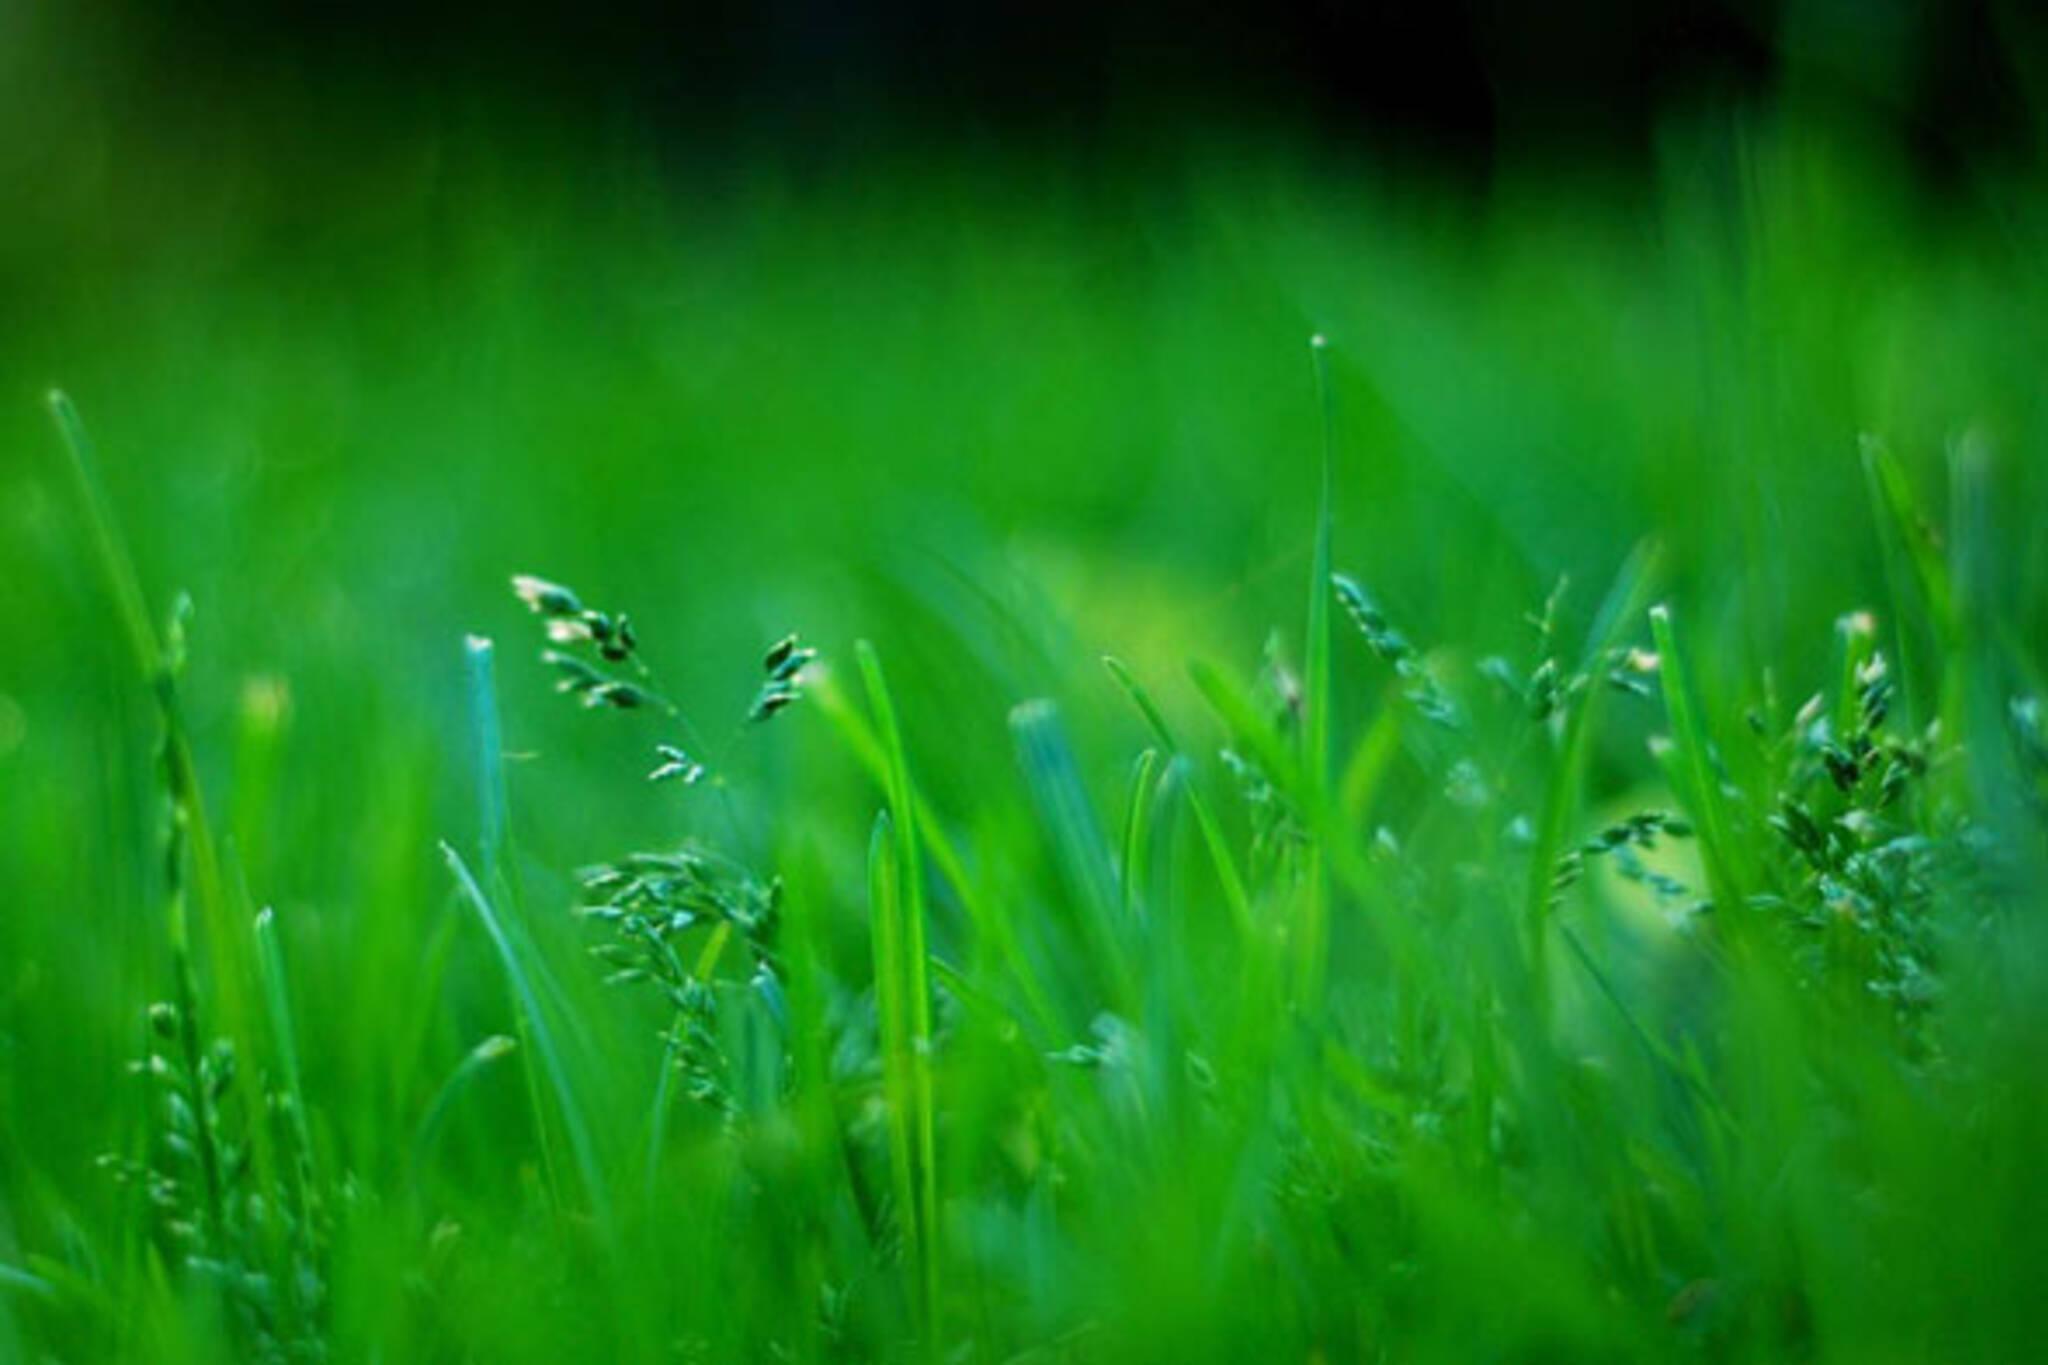 grass toronto